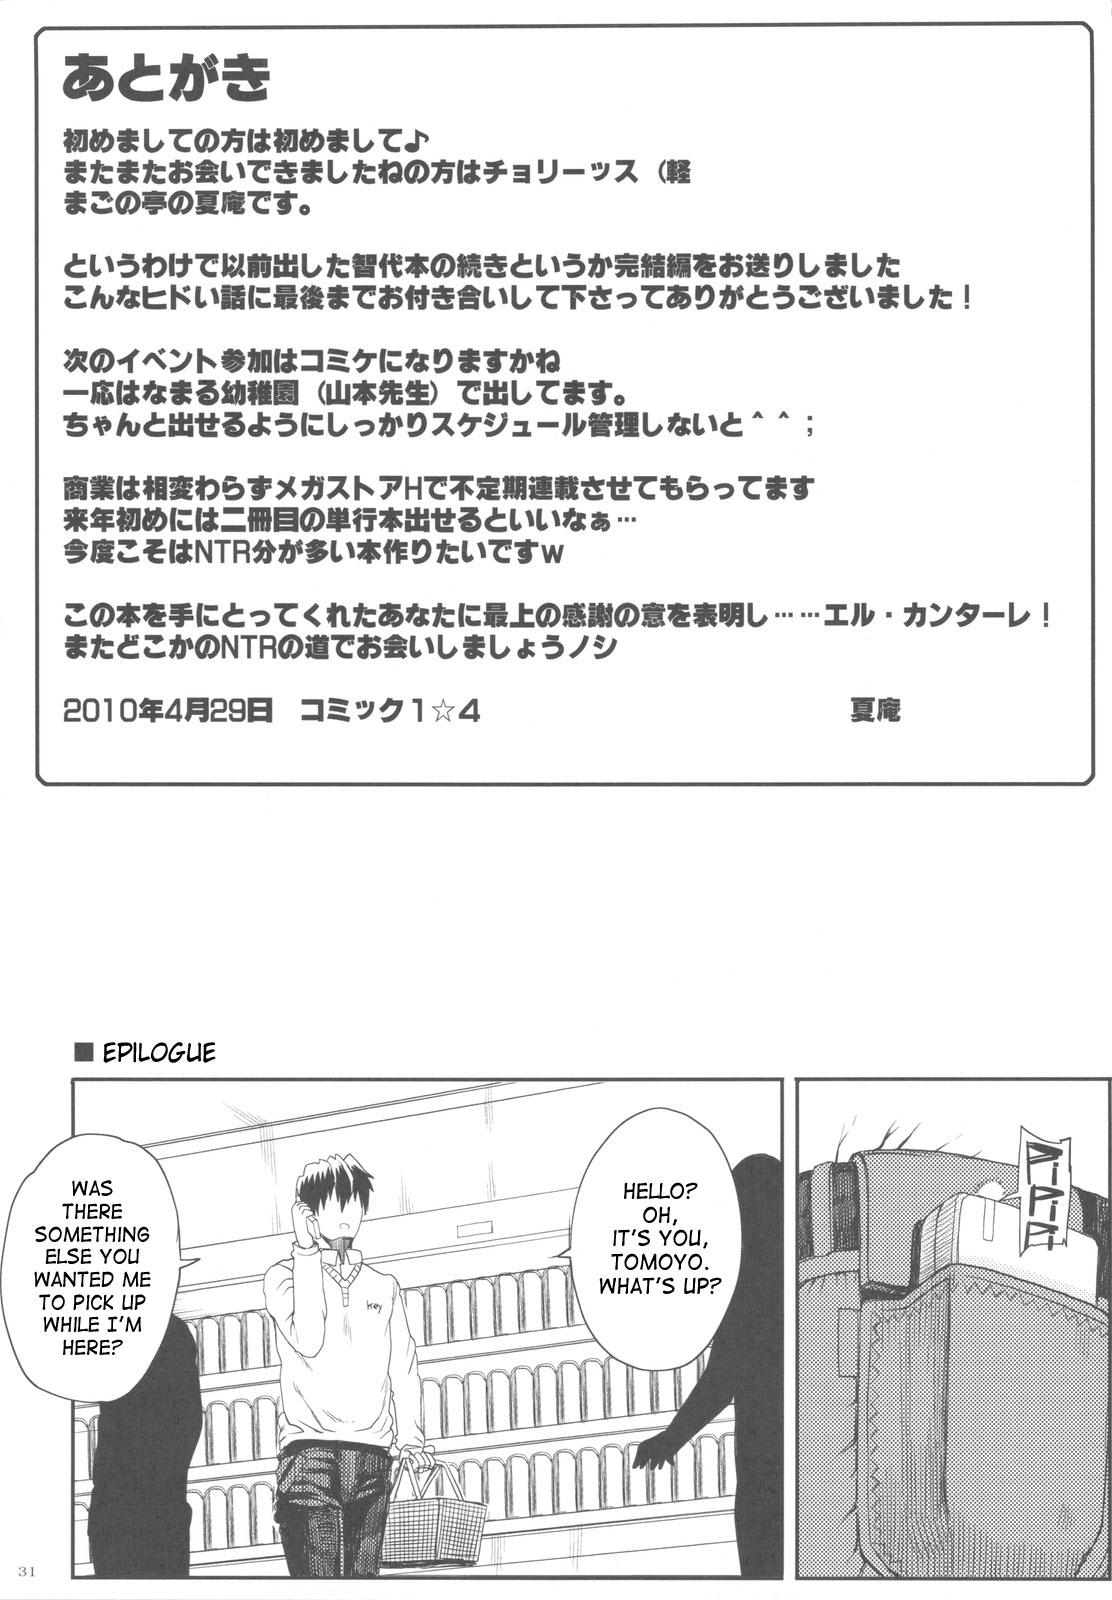 Kayumidome After Tomoyo Hen - Prescription 04 After 31